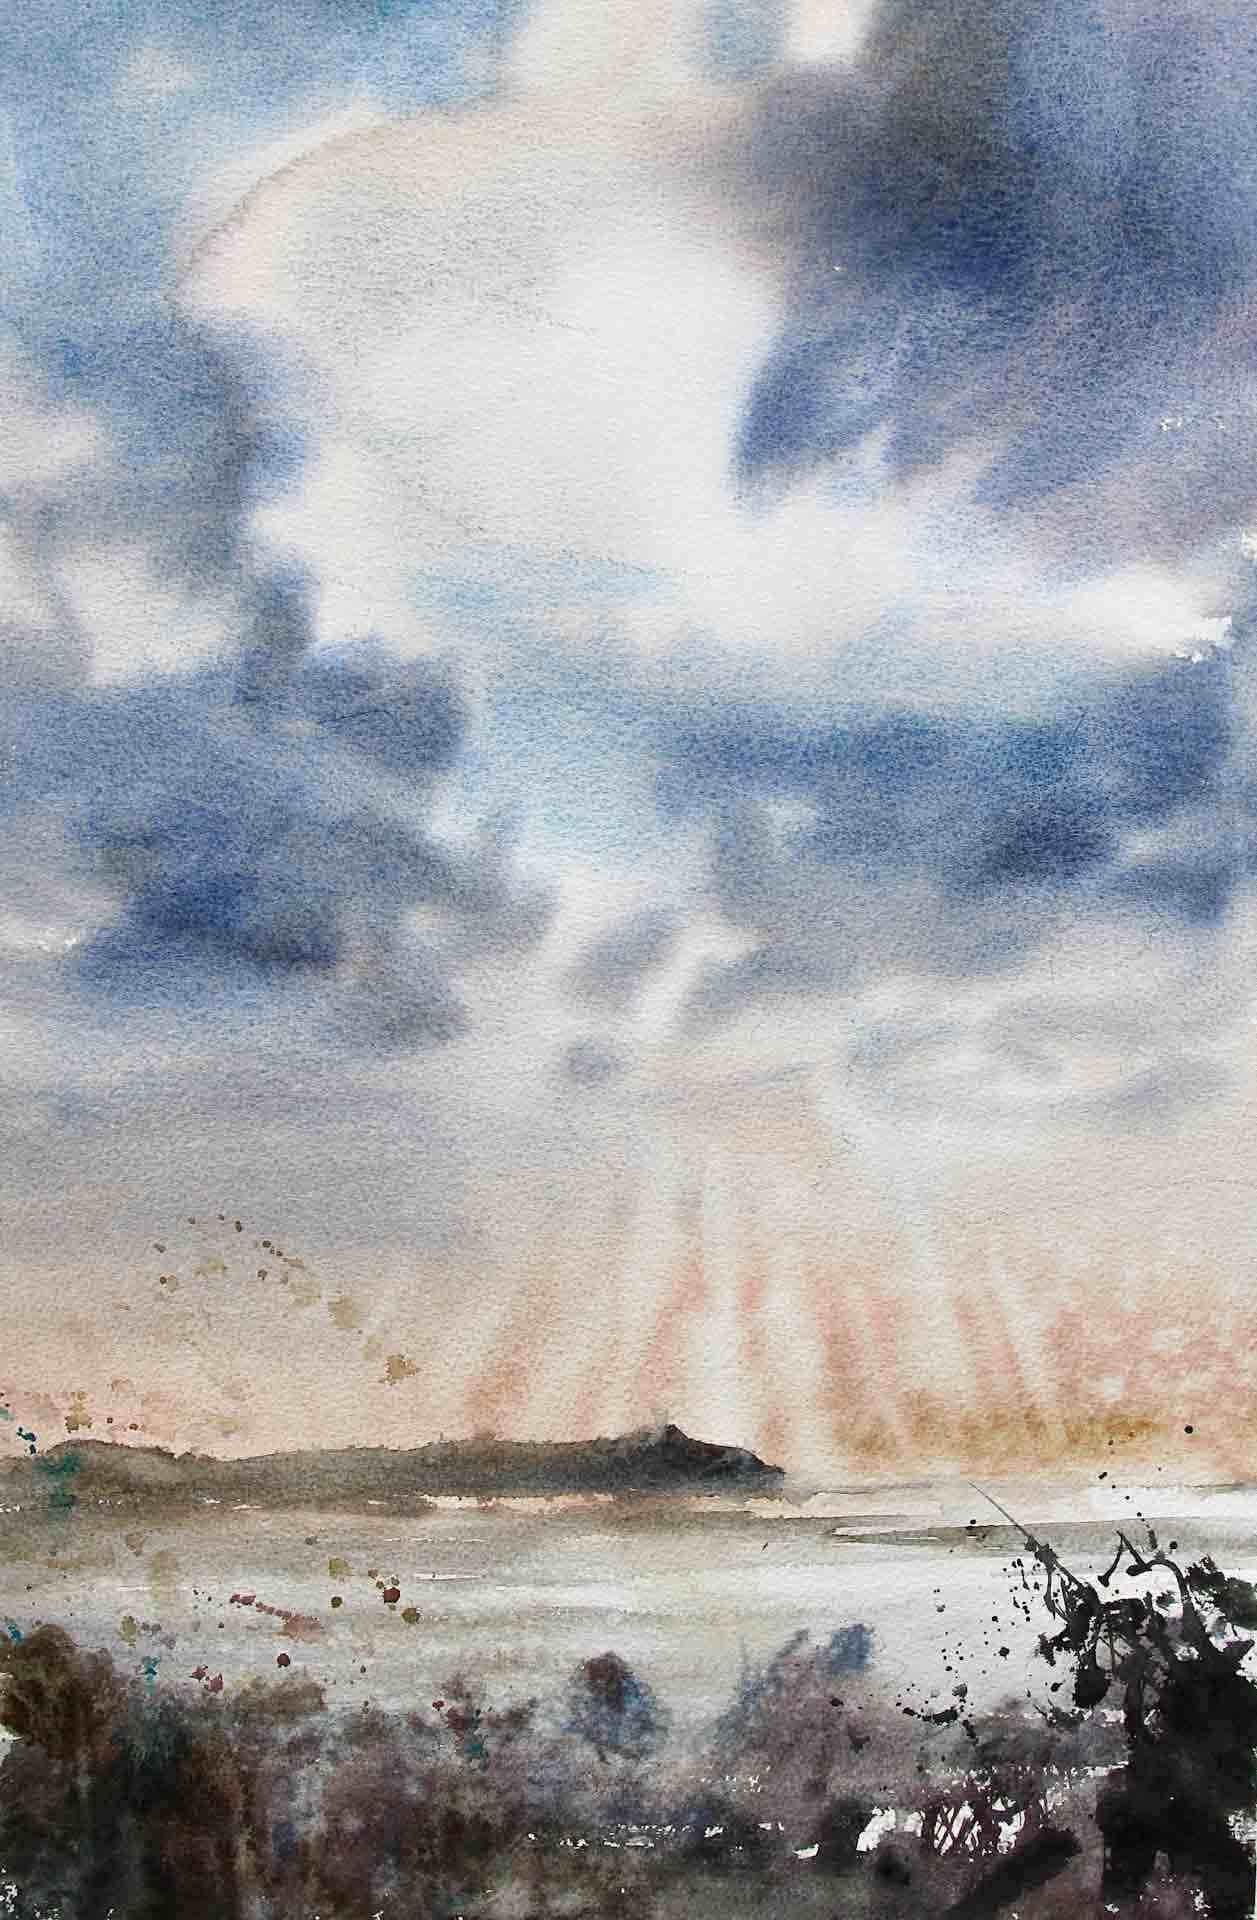 emmanuele cammarano watercolor artist watercolour landscape palinuro